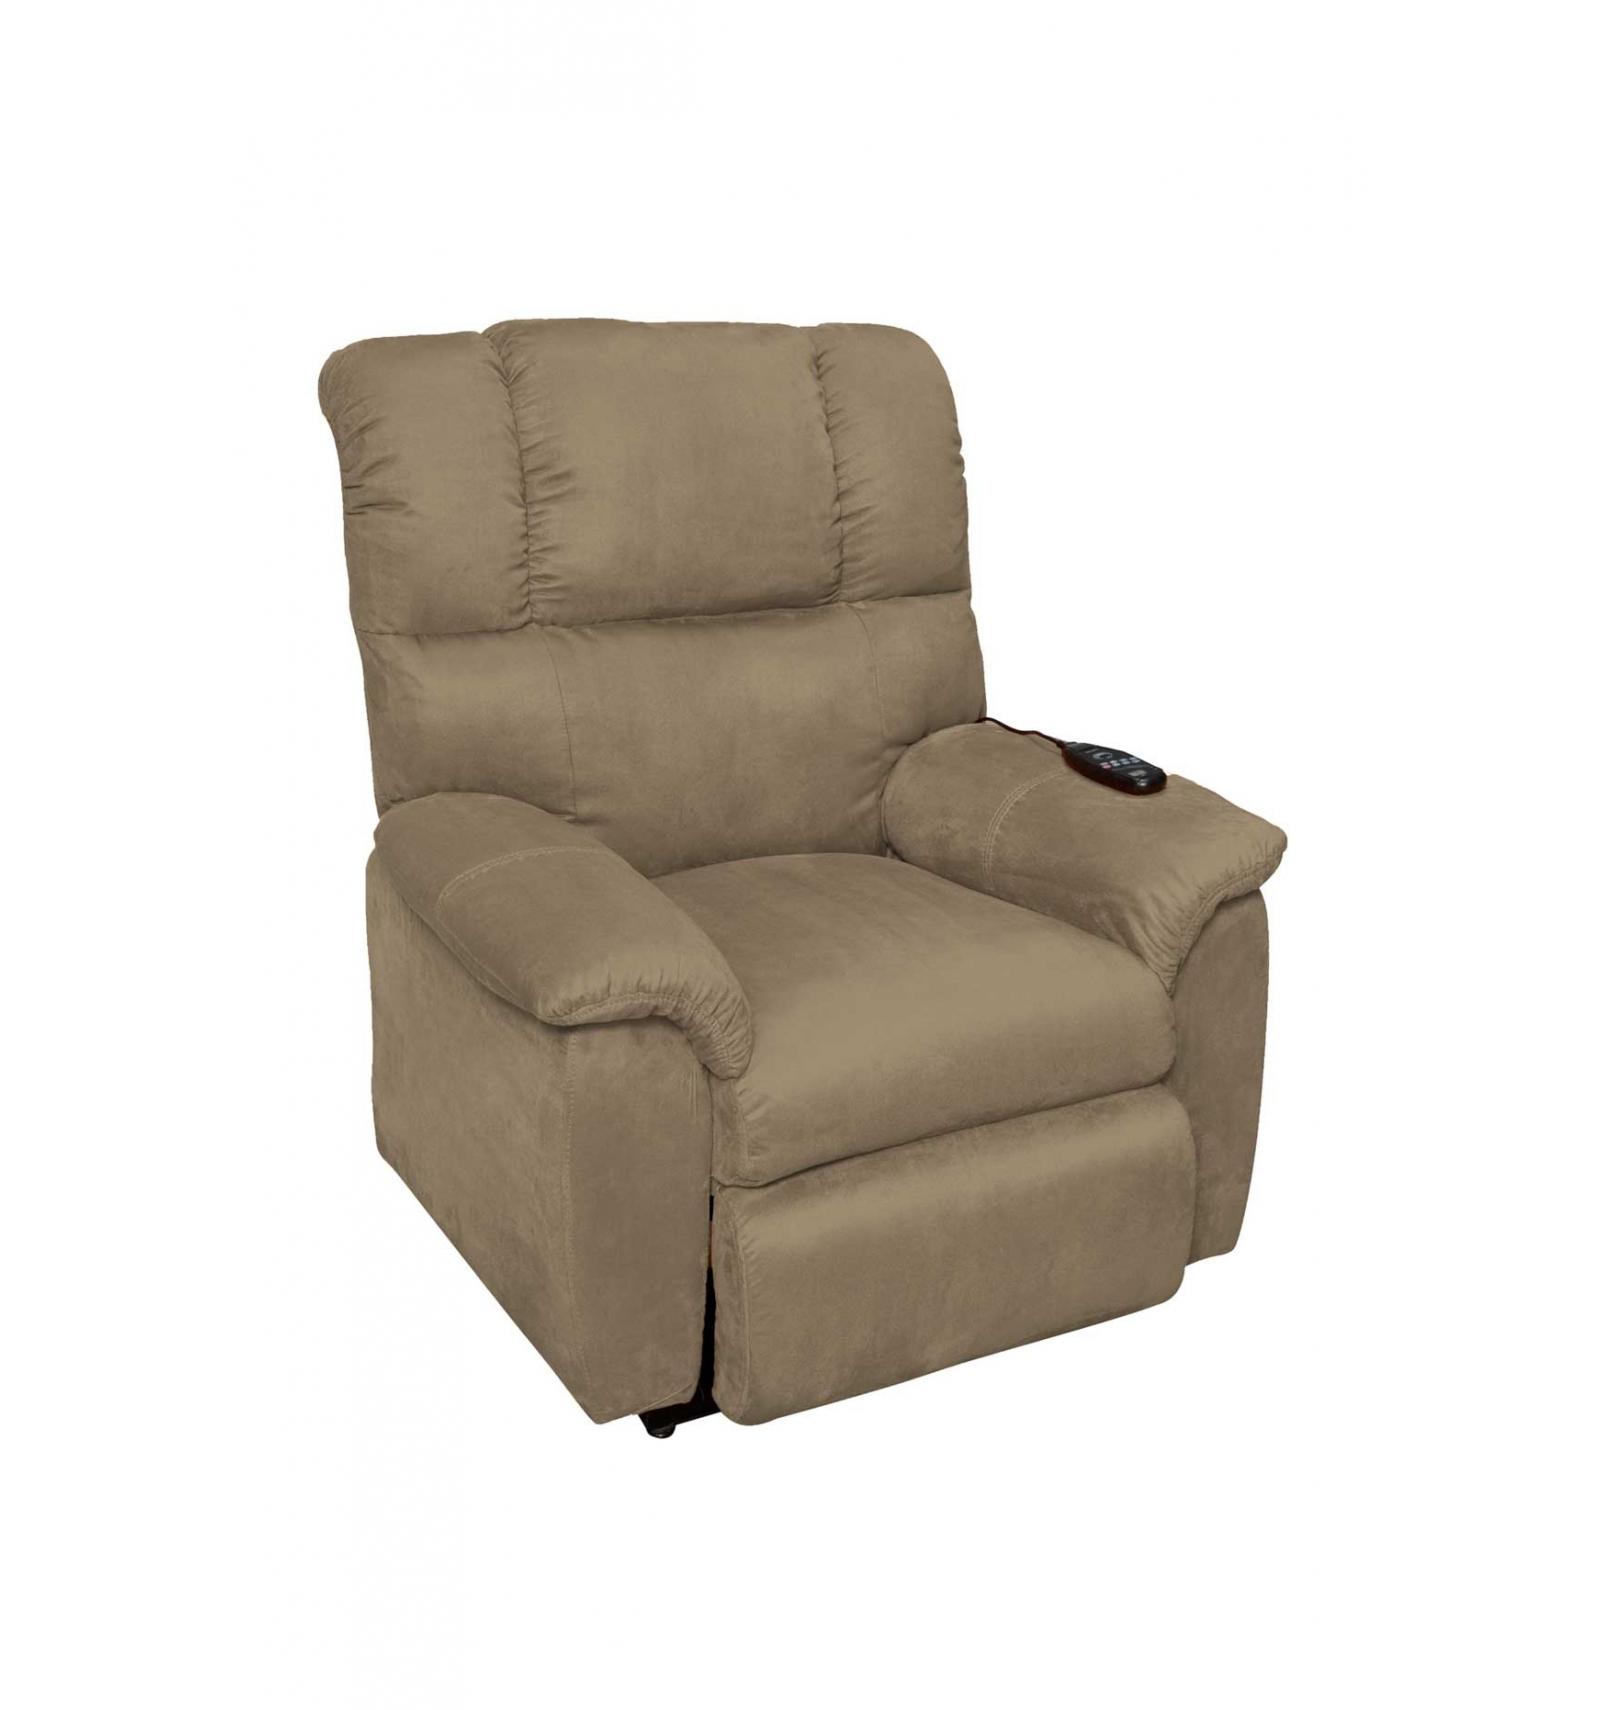 ruhesessel mit aufstehhilfe shqiptoolbar. Black Bedroom Furniture Sets. Home Design Ideas